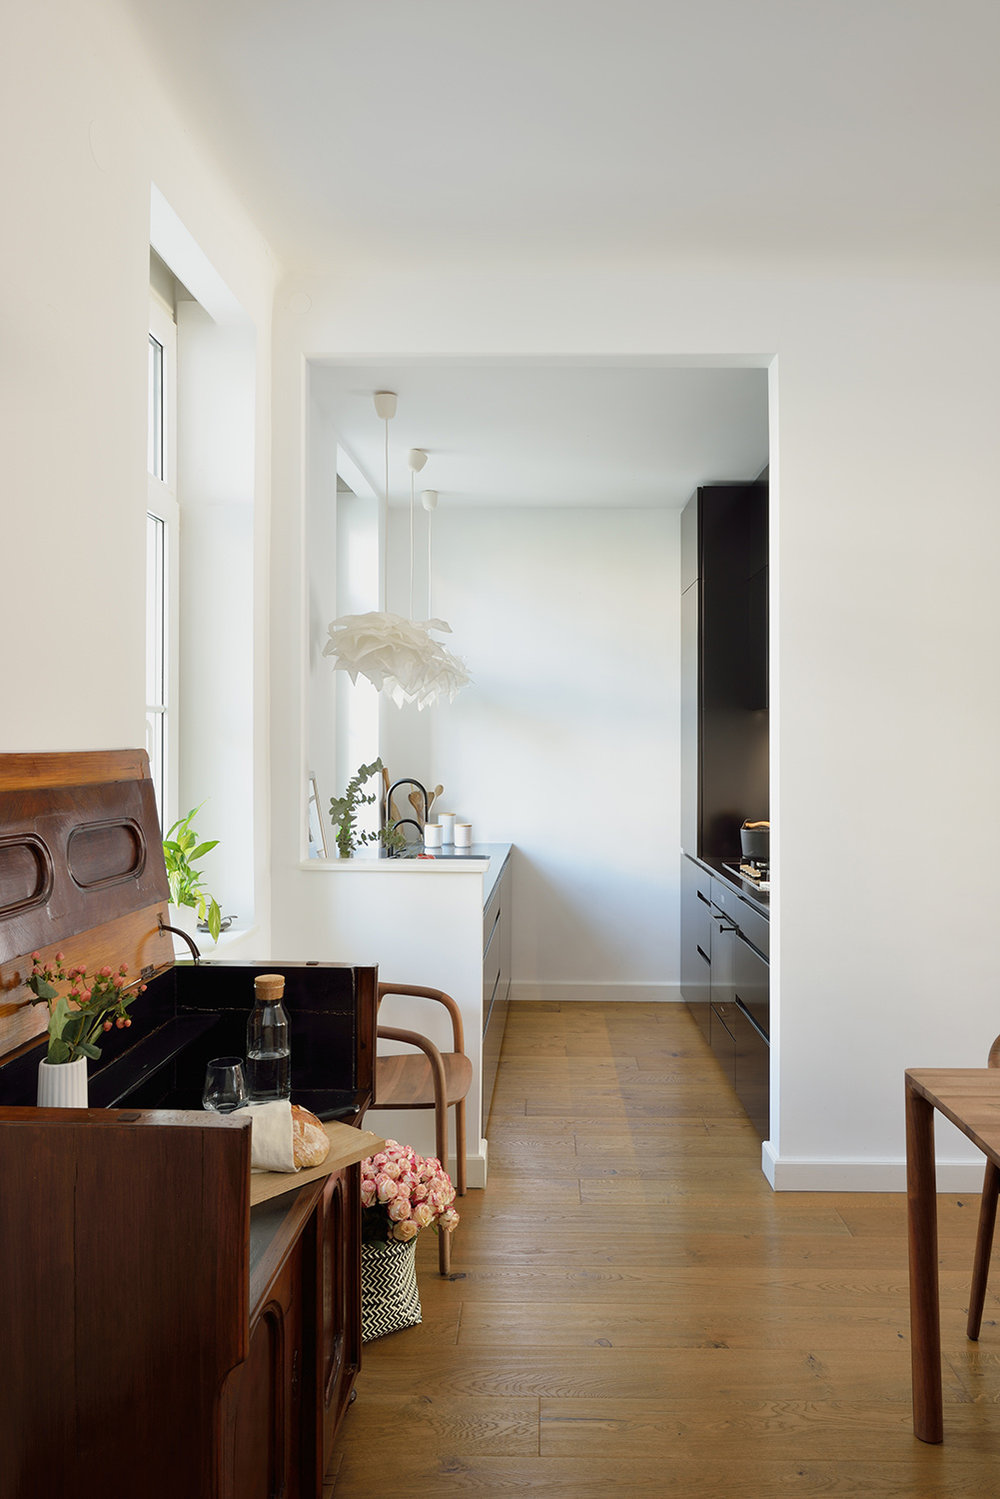 interior-Tina Rugelj_foto-Miran Kambič_AP N_kuhinja-kitchen_04.jpg